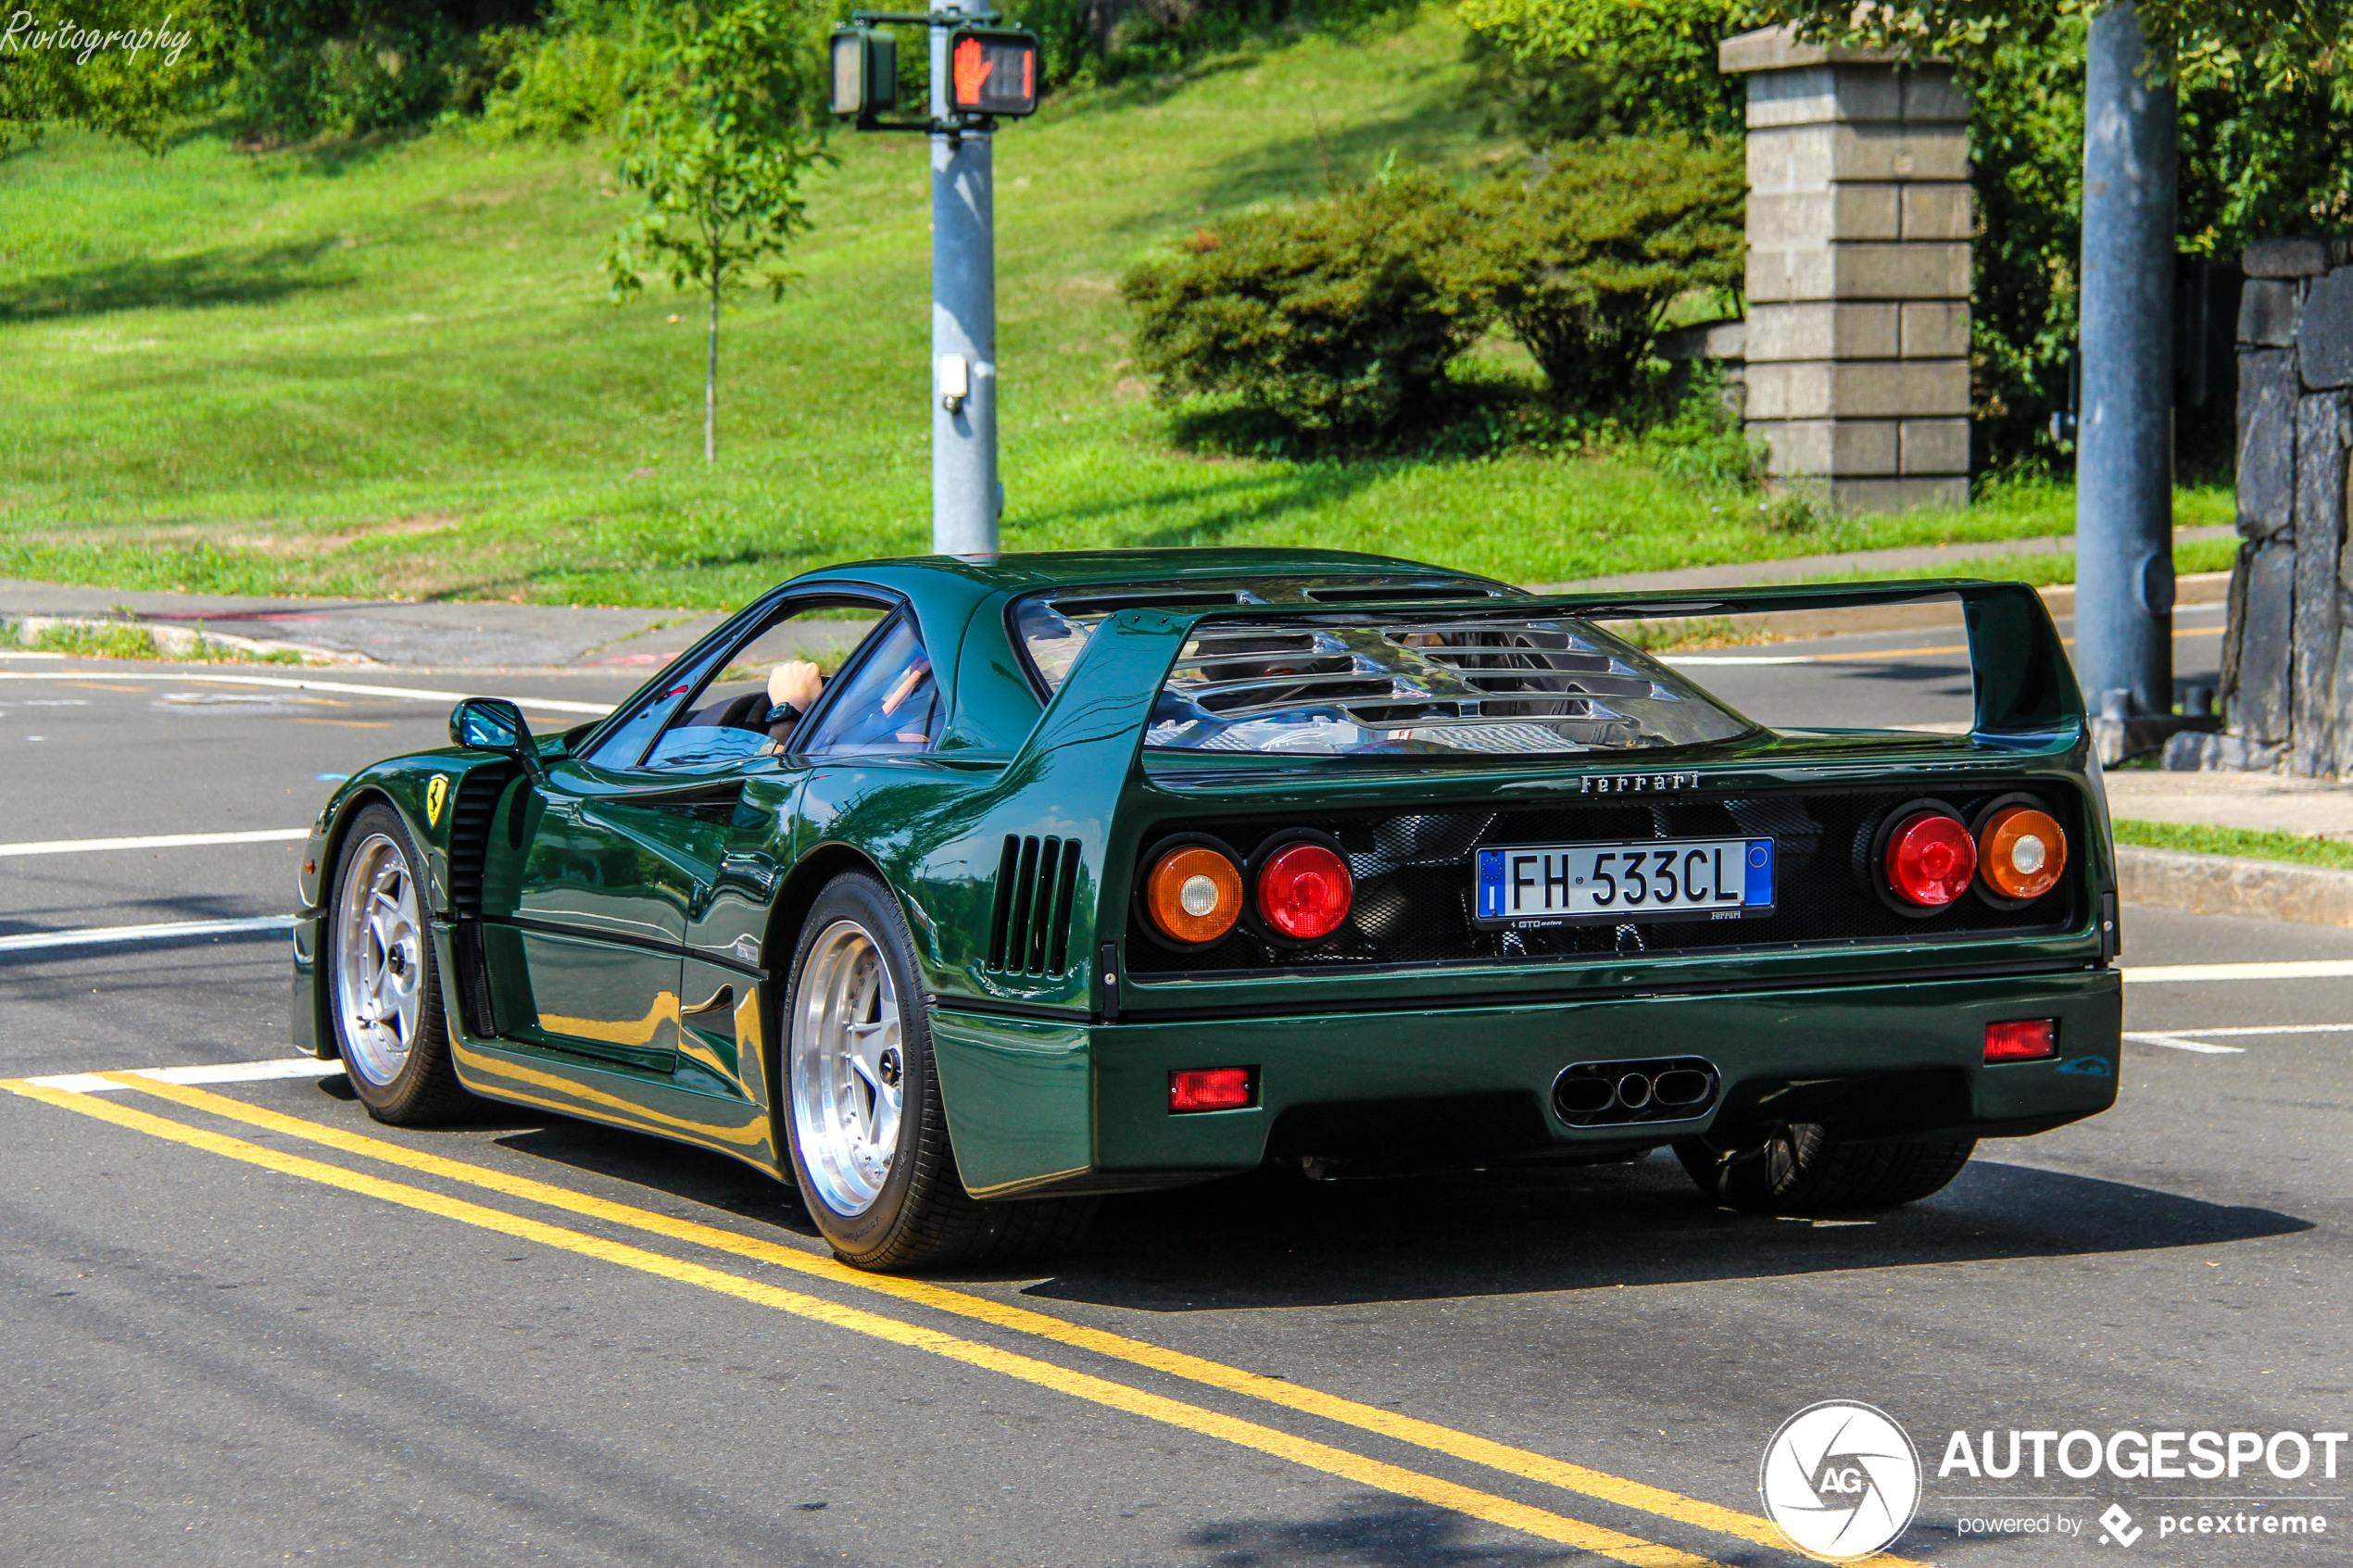 Topspot: Ferrari F40 in Verde Abetone